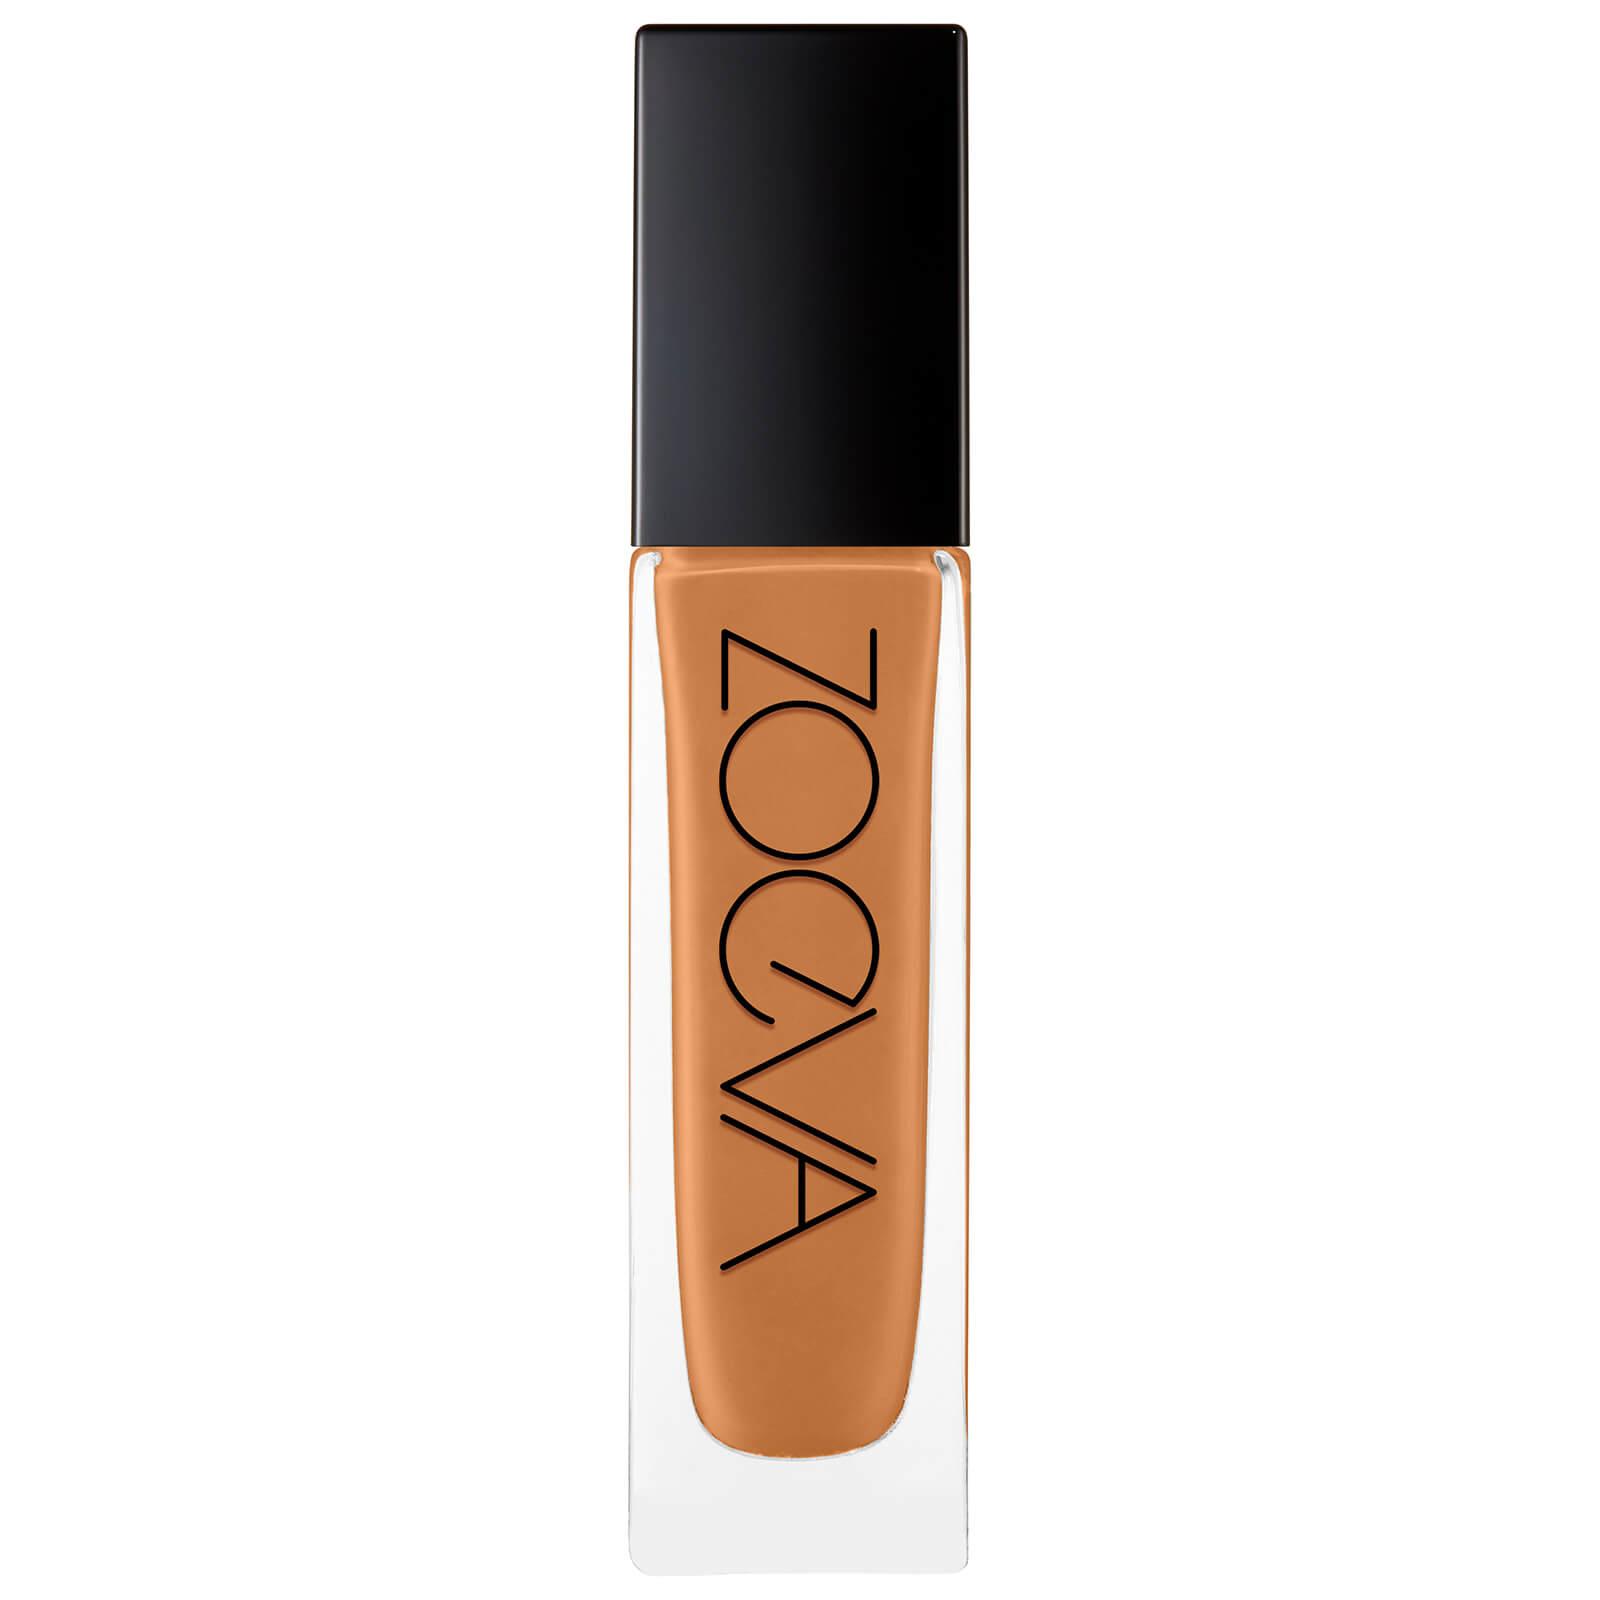 ZOEVA Authentik Skin Foundation 30ml (Various Shades) - 270N Honest